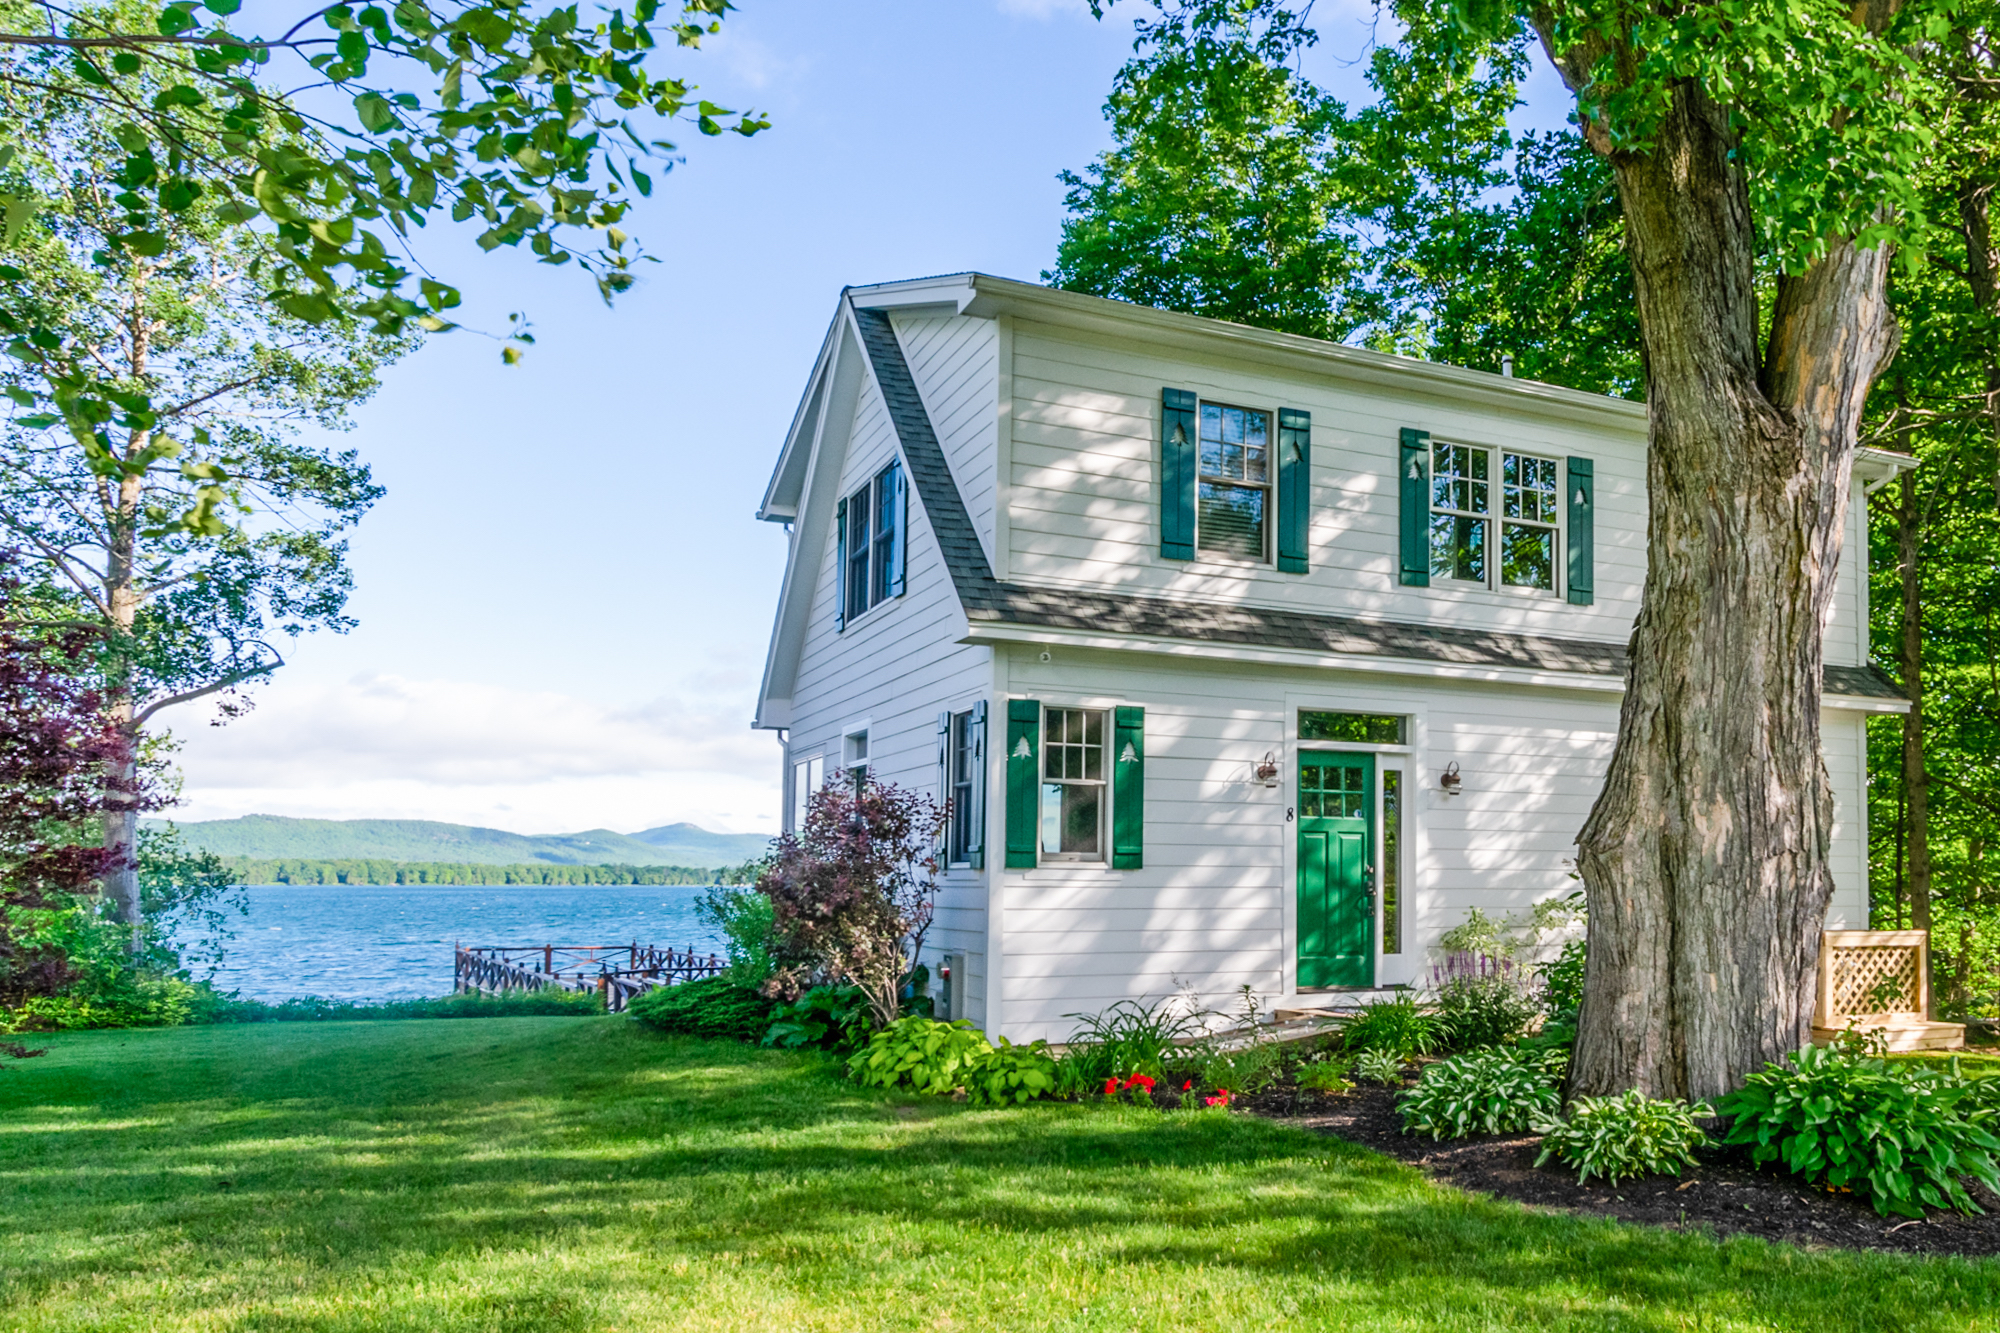 Takundewide Cottage #8 exteriorDSC_0005